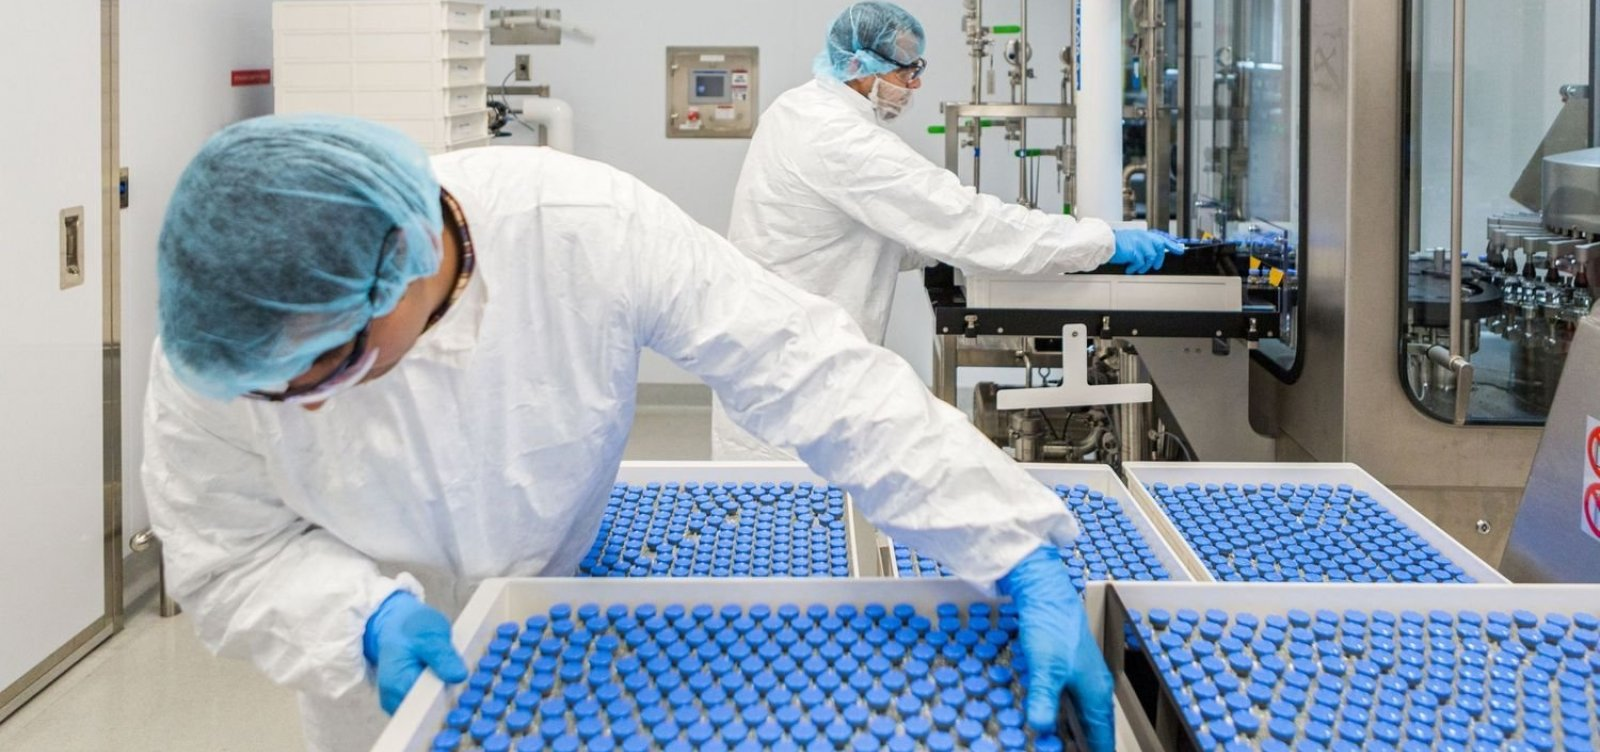 [Rússia disponibilizará remédio contra coronavírus na próxima semana]